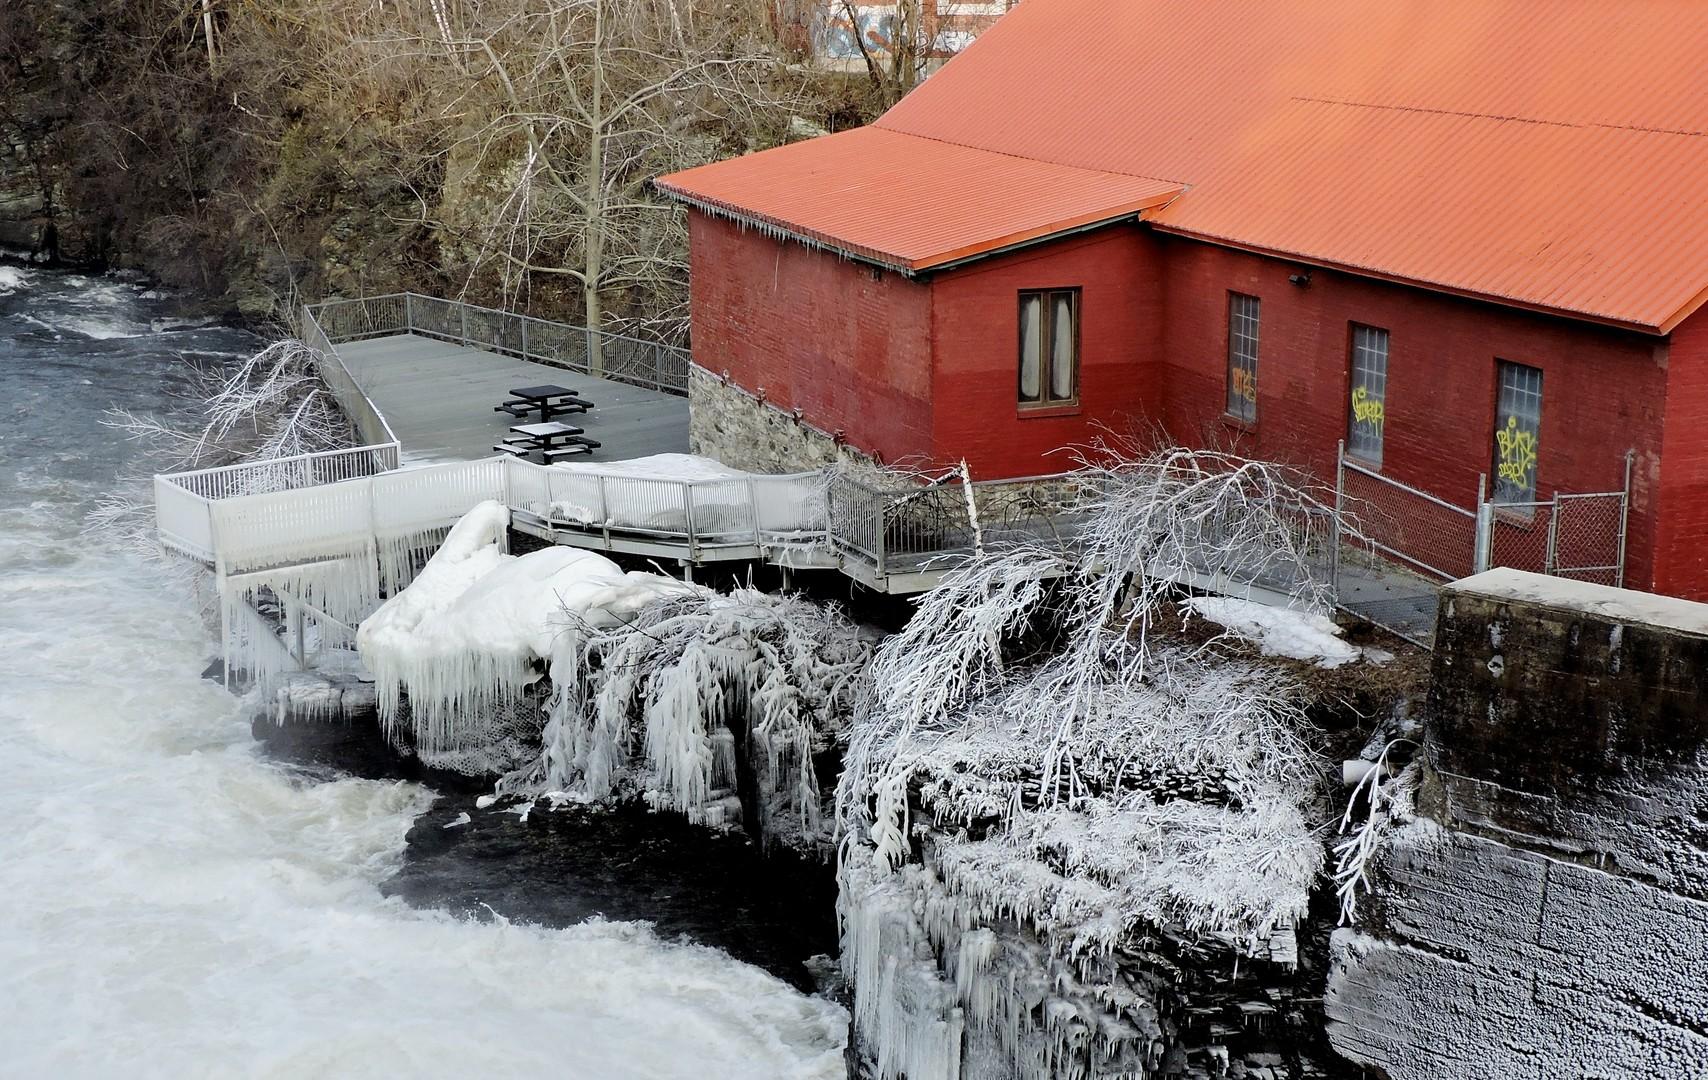 Hidro centrala Frontenac u Sherbrooke